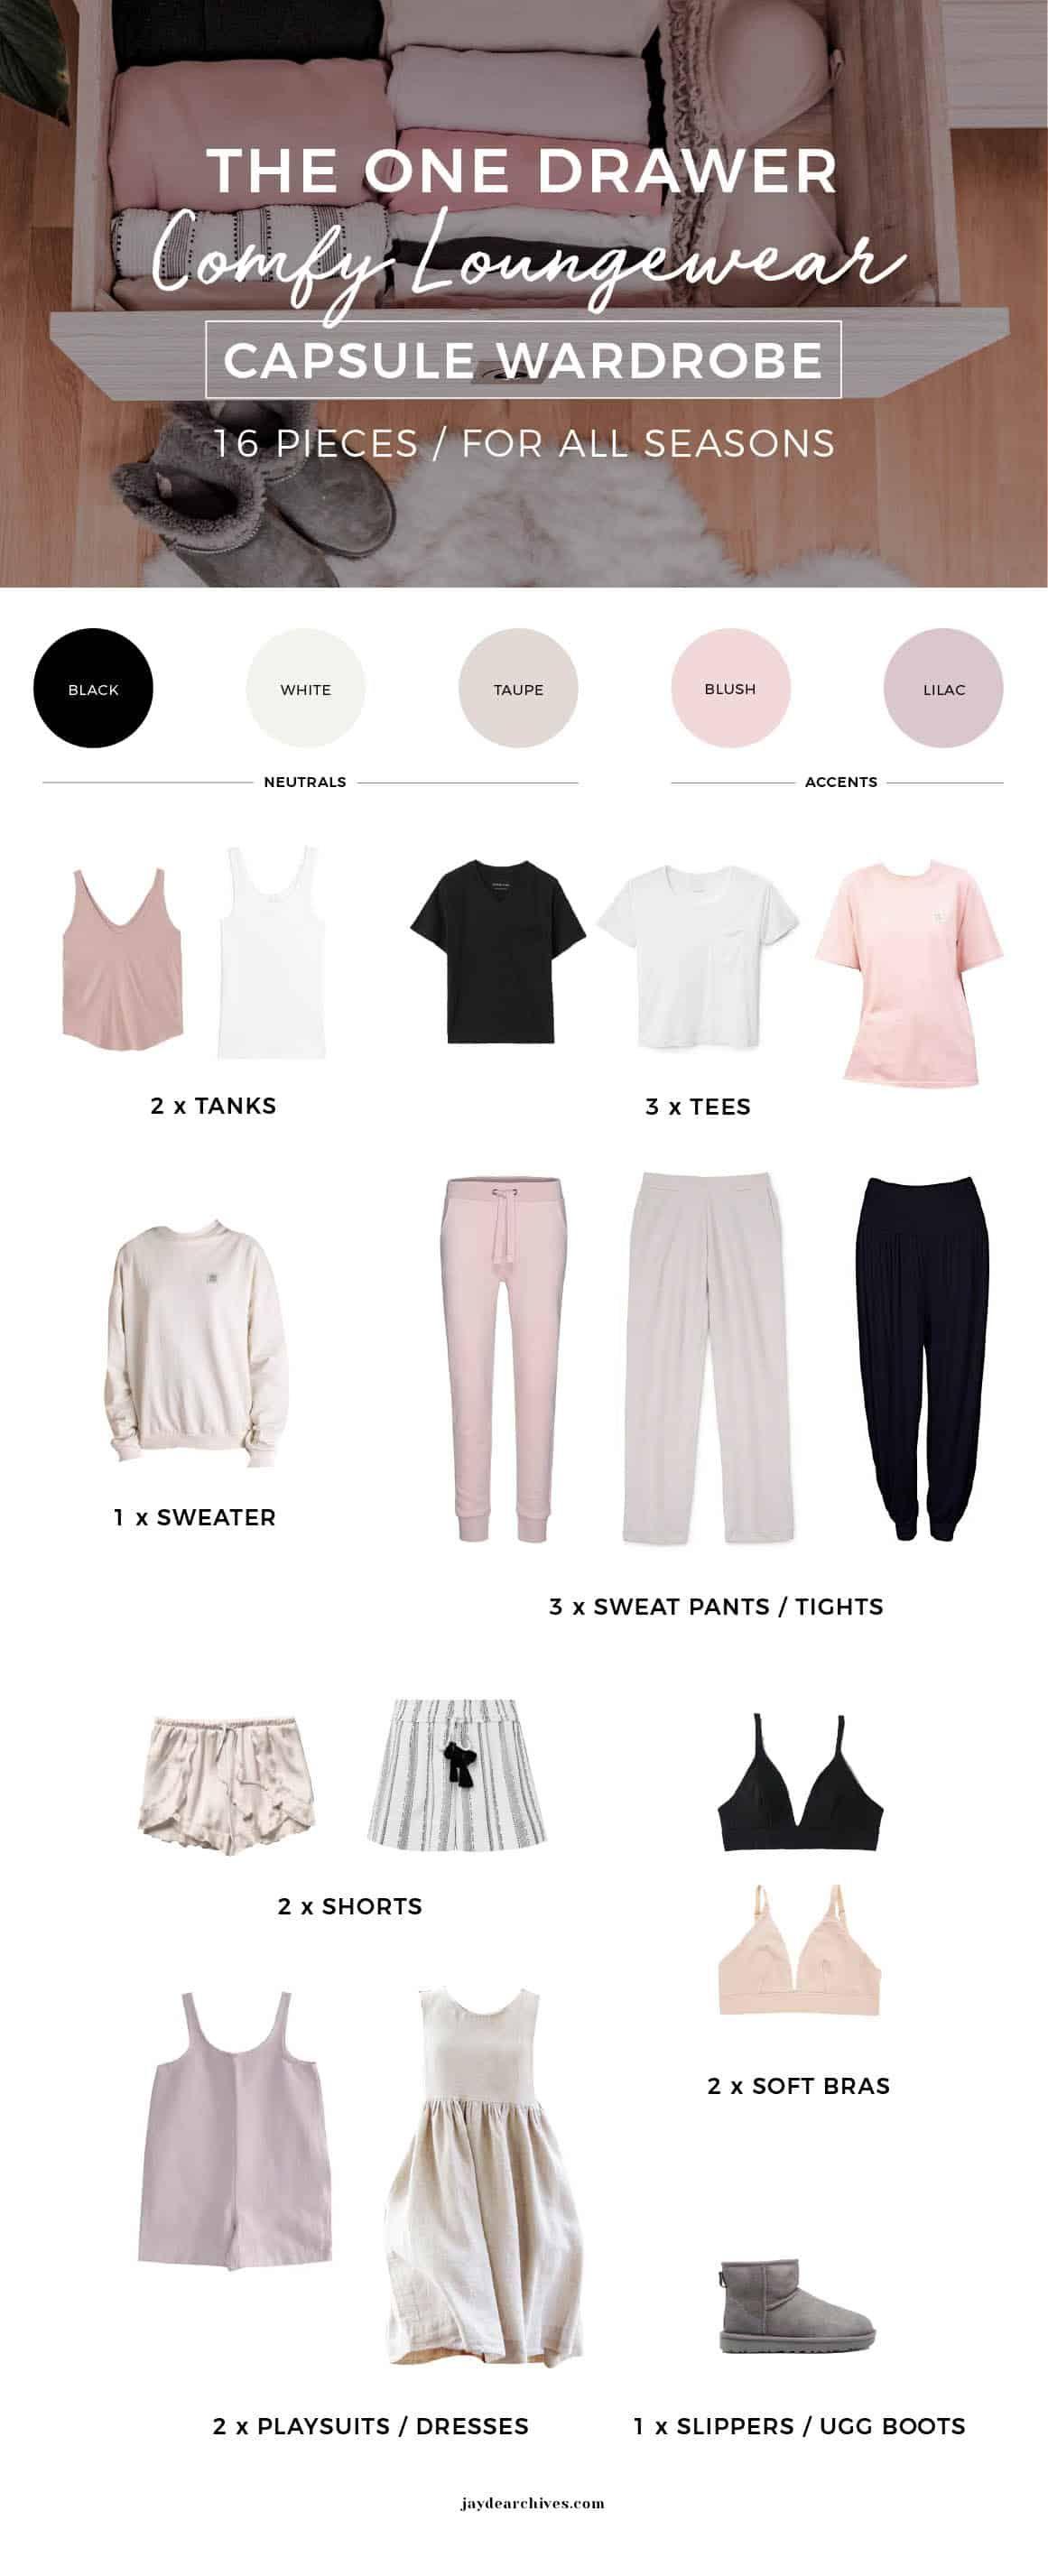 The One Drawer Loungewear Capsule Wardrobe | Jayde Archives